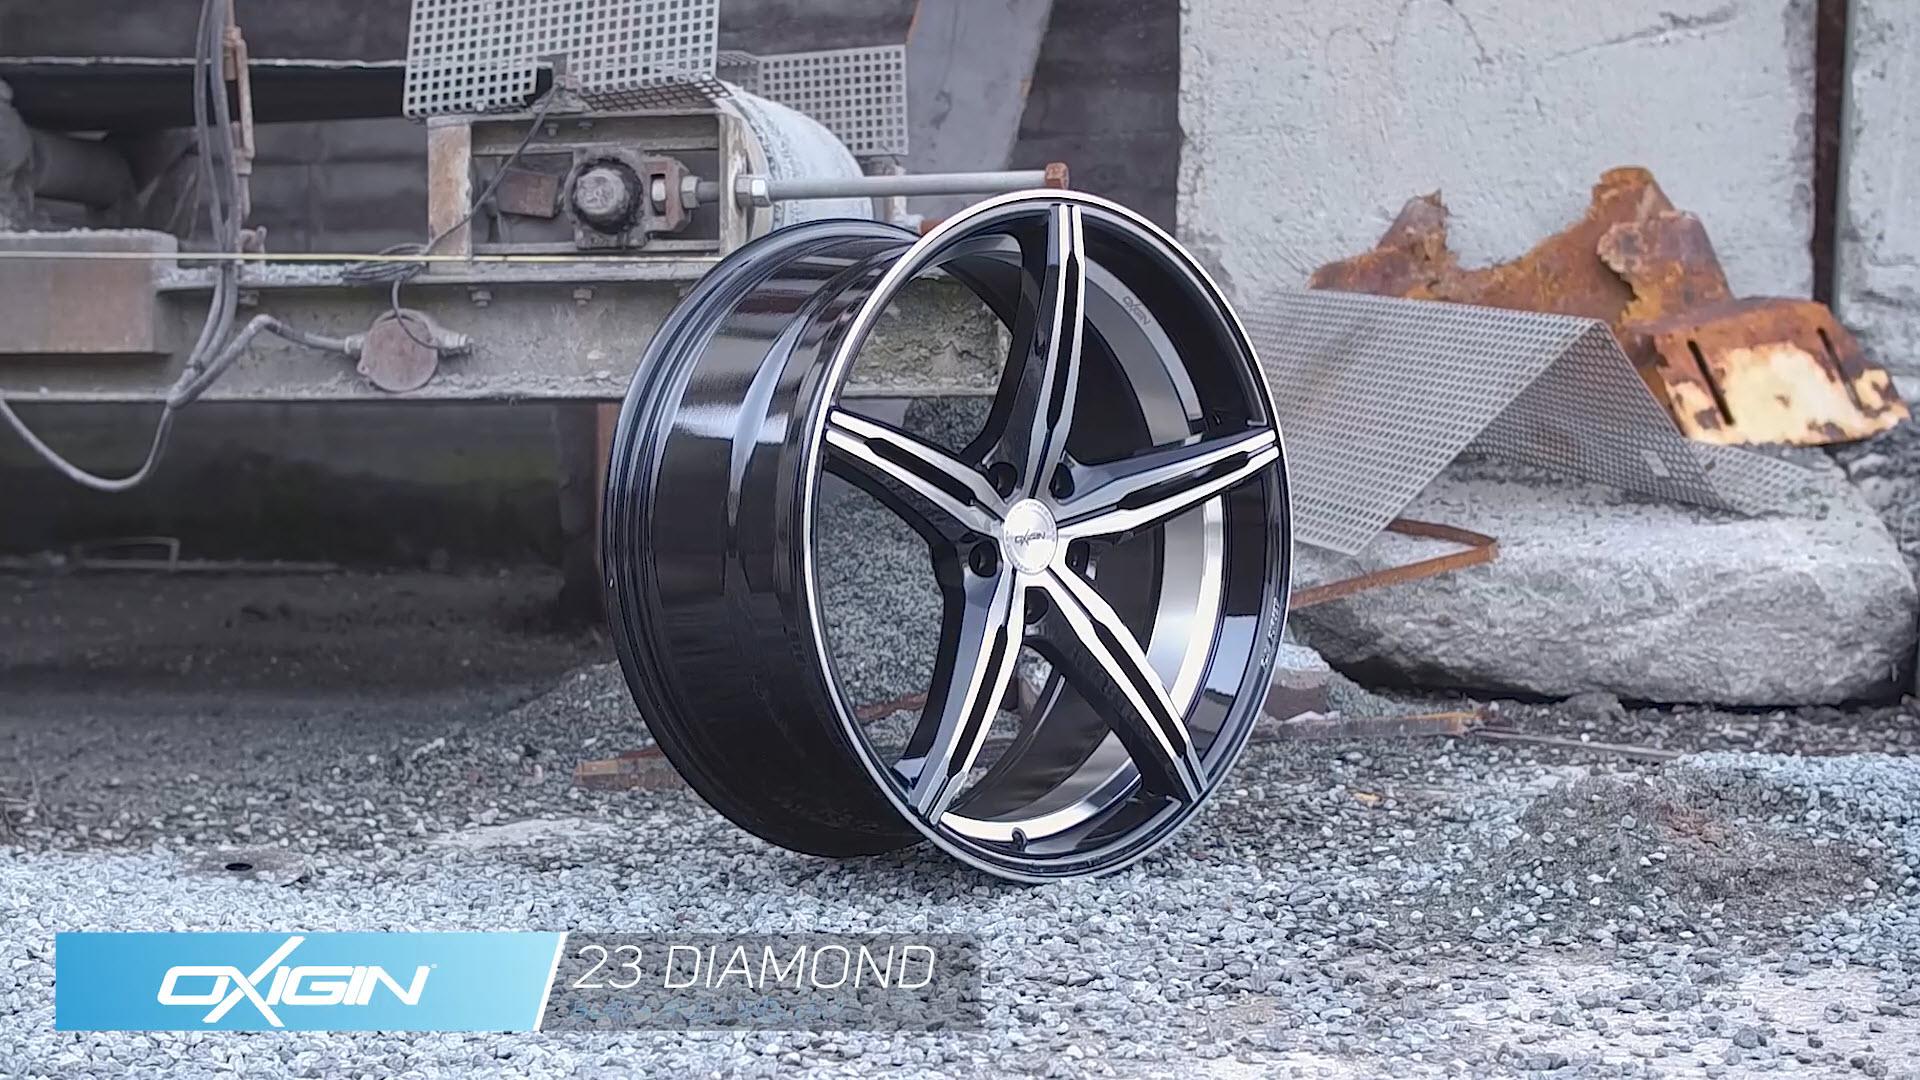 OX 23 Diamond Black Full Polish und Ambiente